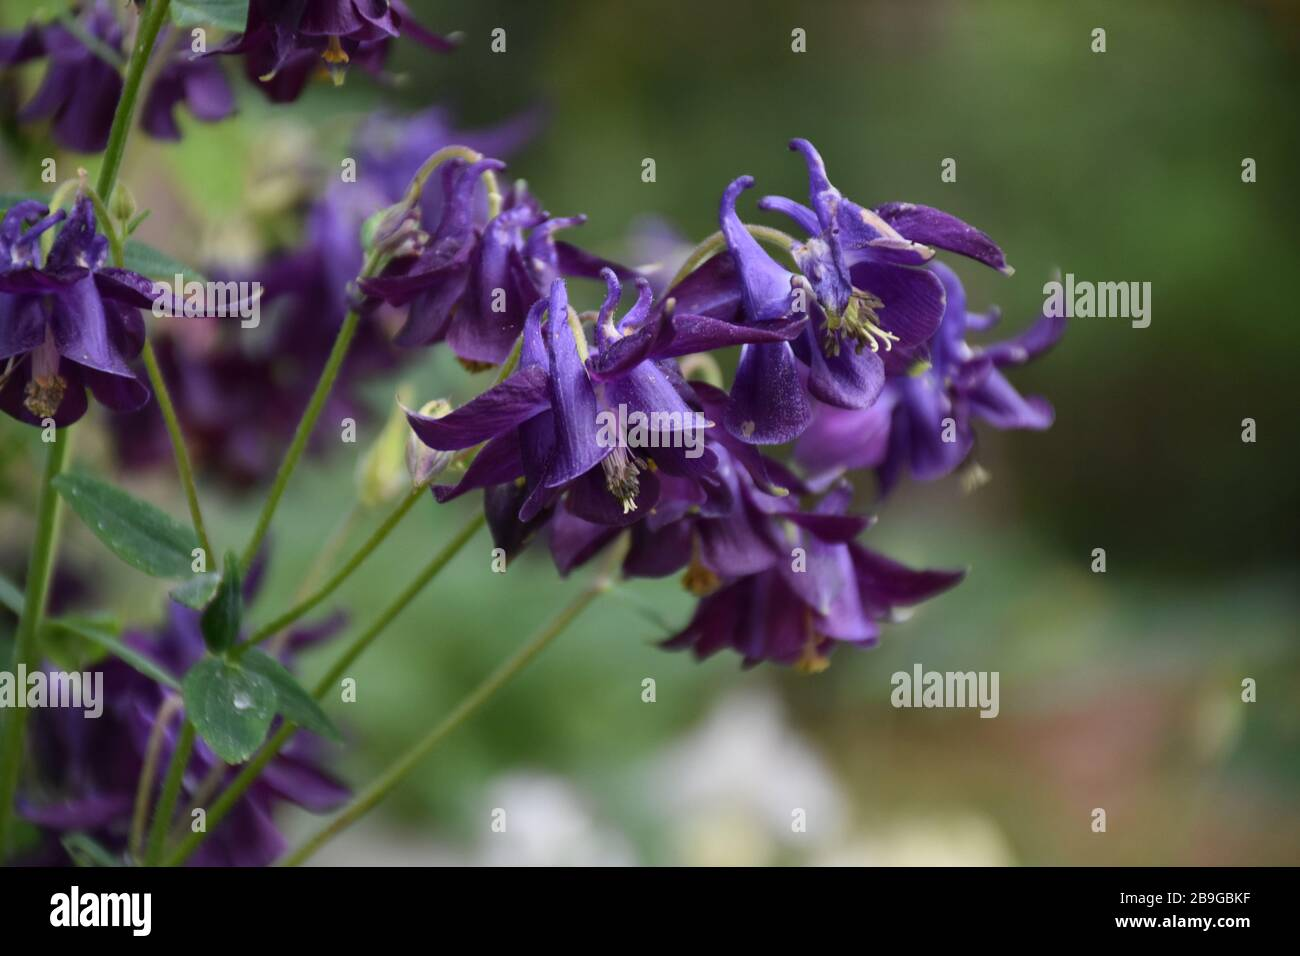 Garden With Very Pretty Dark Purple Columbine Flowers Blooming